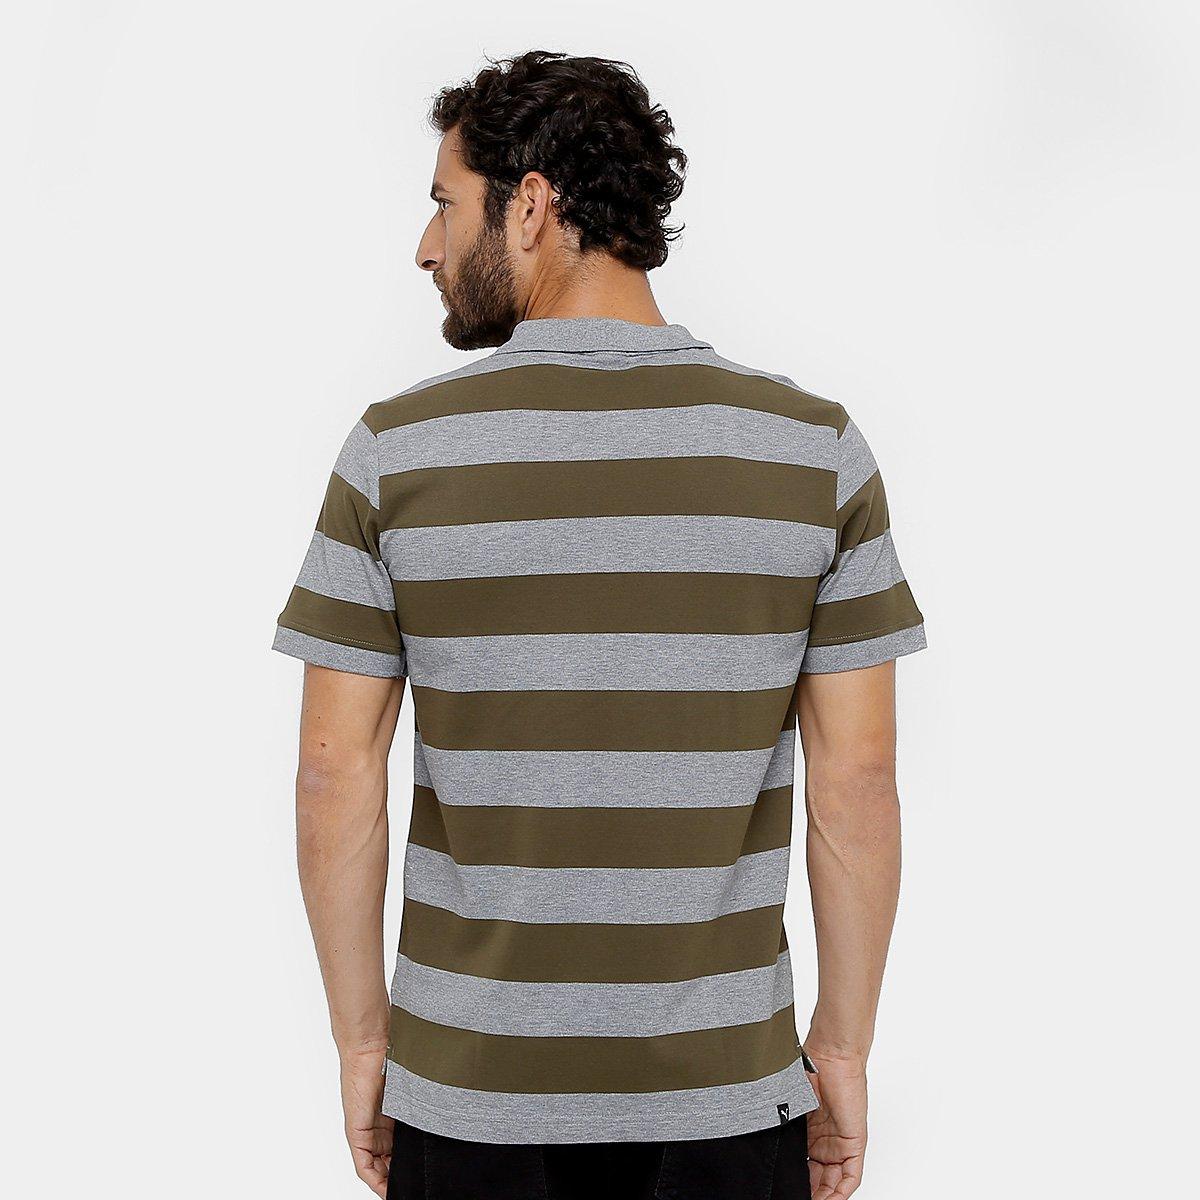 Camisa Polo Puma Ess Striped Pique Masculina - Verde escuro - Compre ... 1be13b984c16d